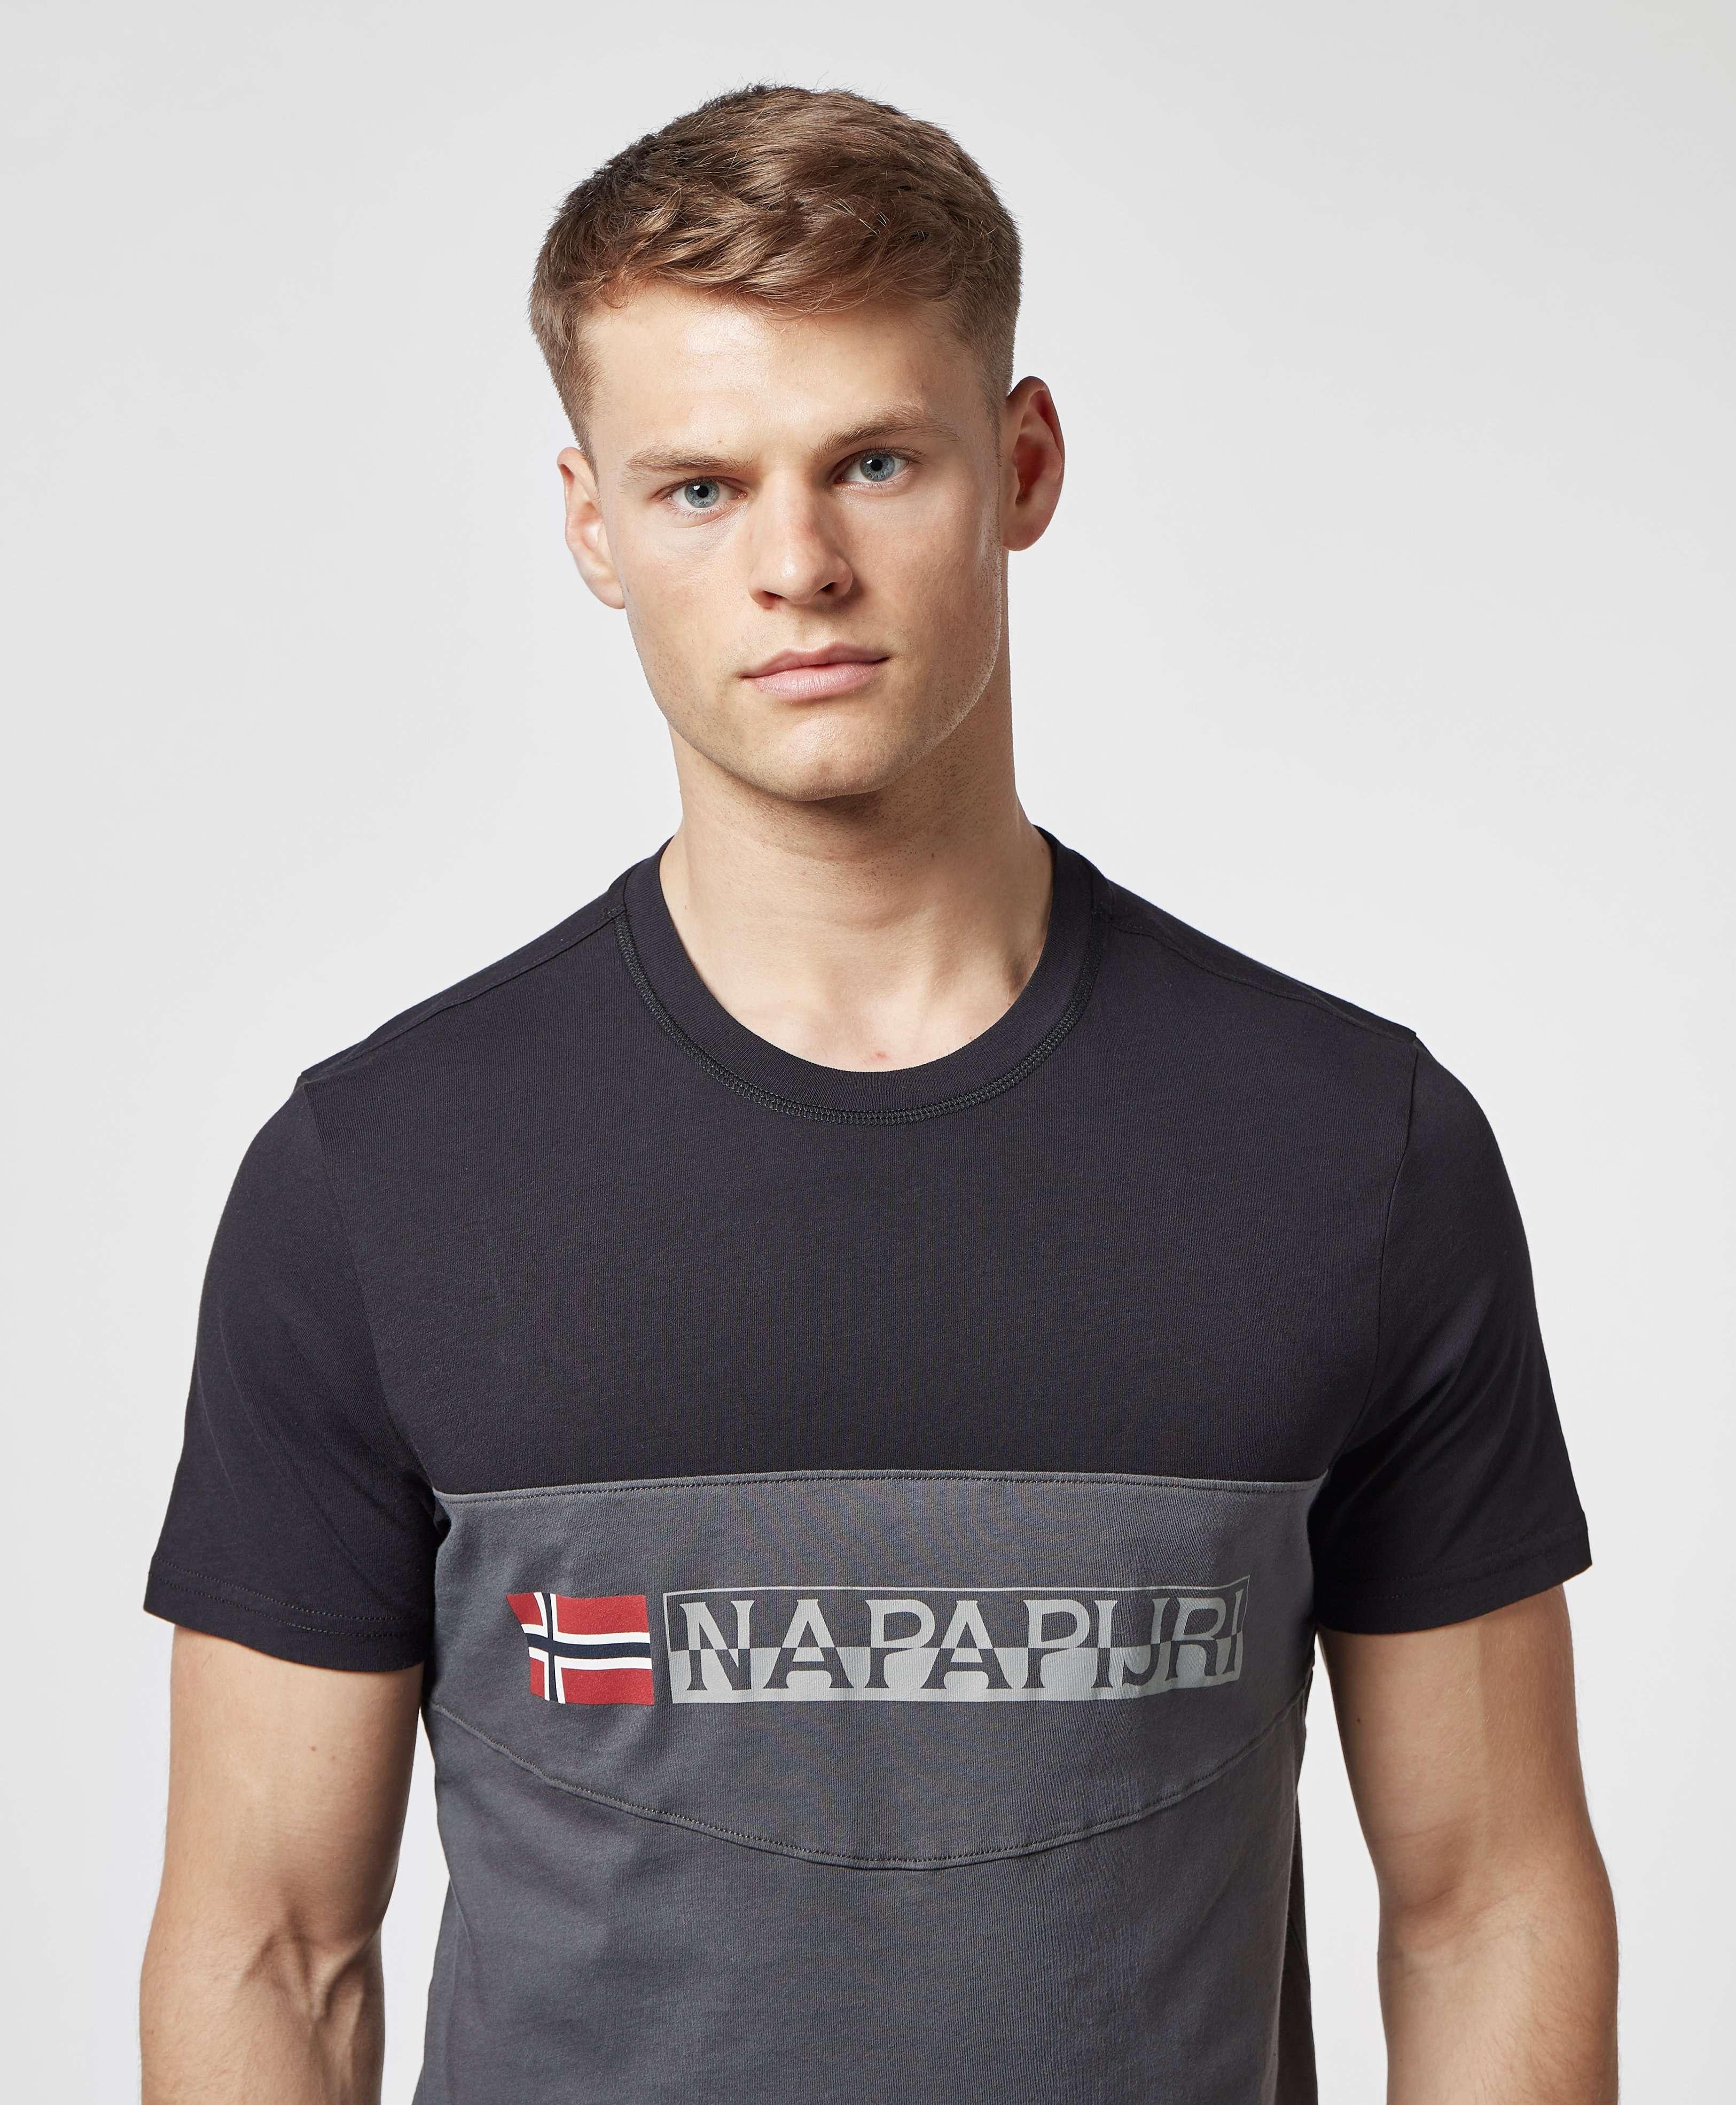 Napapijri Colour Block Linear Short Sleeve T-Shirt